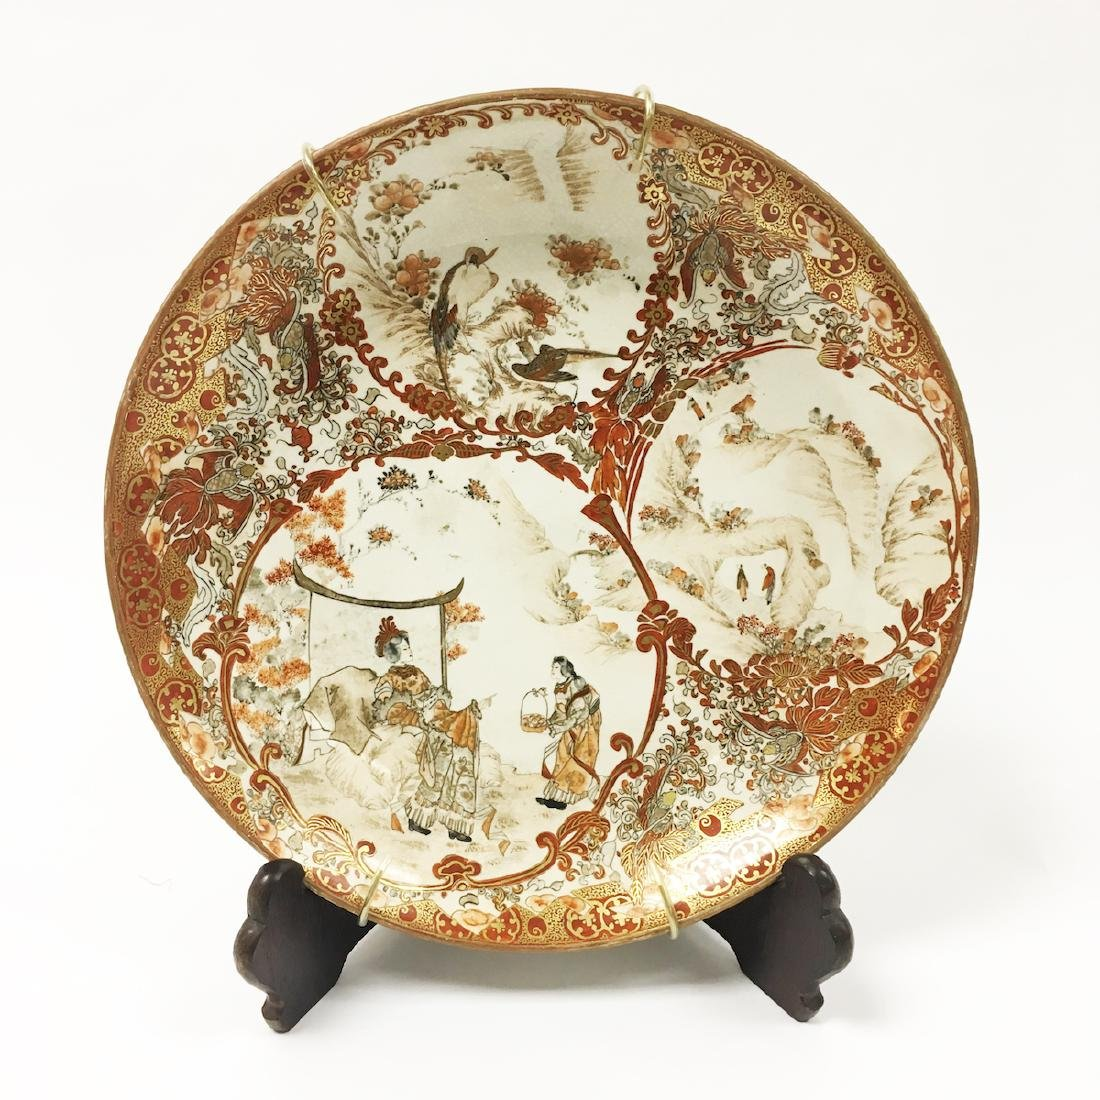 Japanese Porcelain Signed Charger